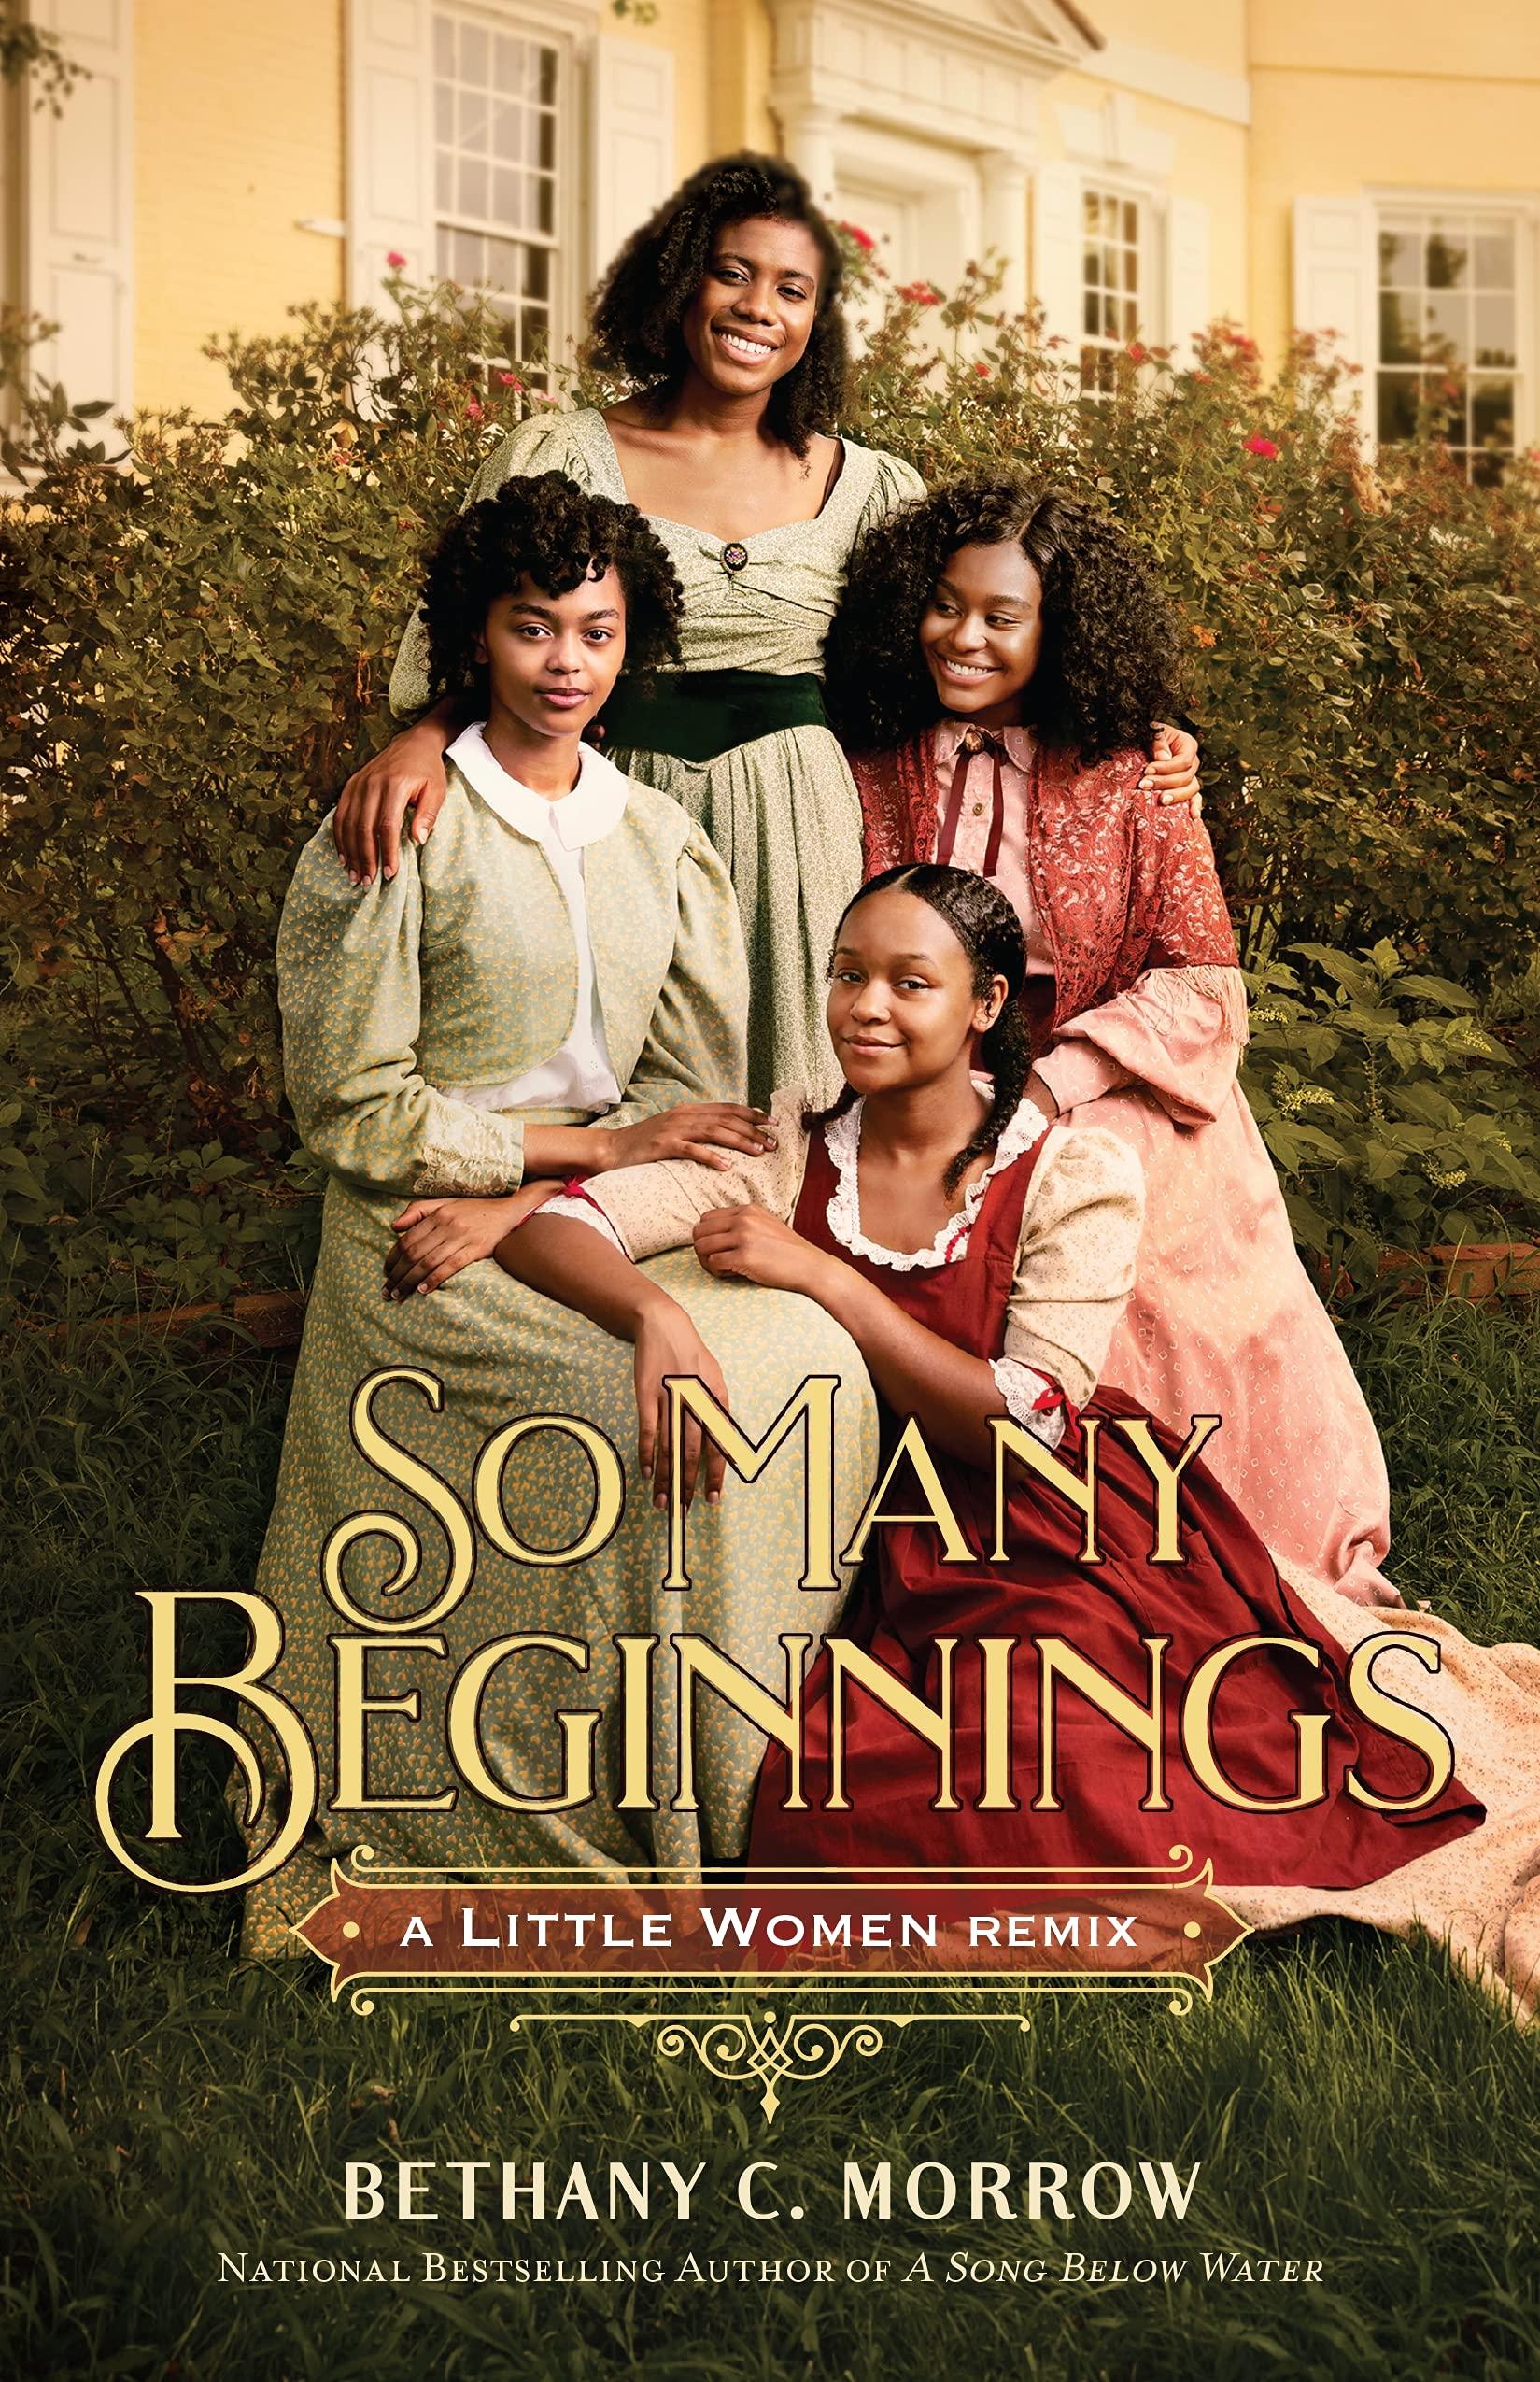 Amazon.com: So Many Beginnings: A Little Women Remix (Remixed Classics, 2):  9781250761217: Morrow, Bethany C.: Books